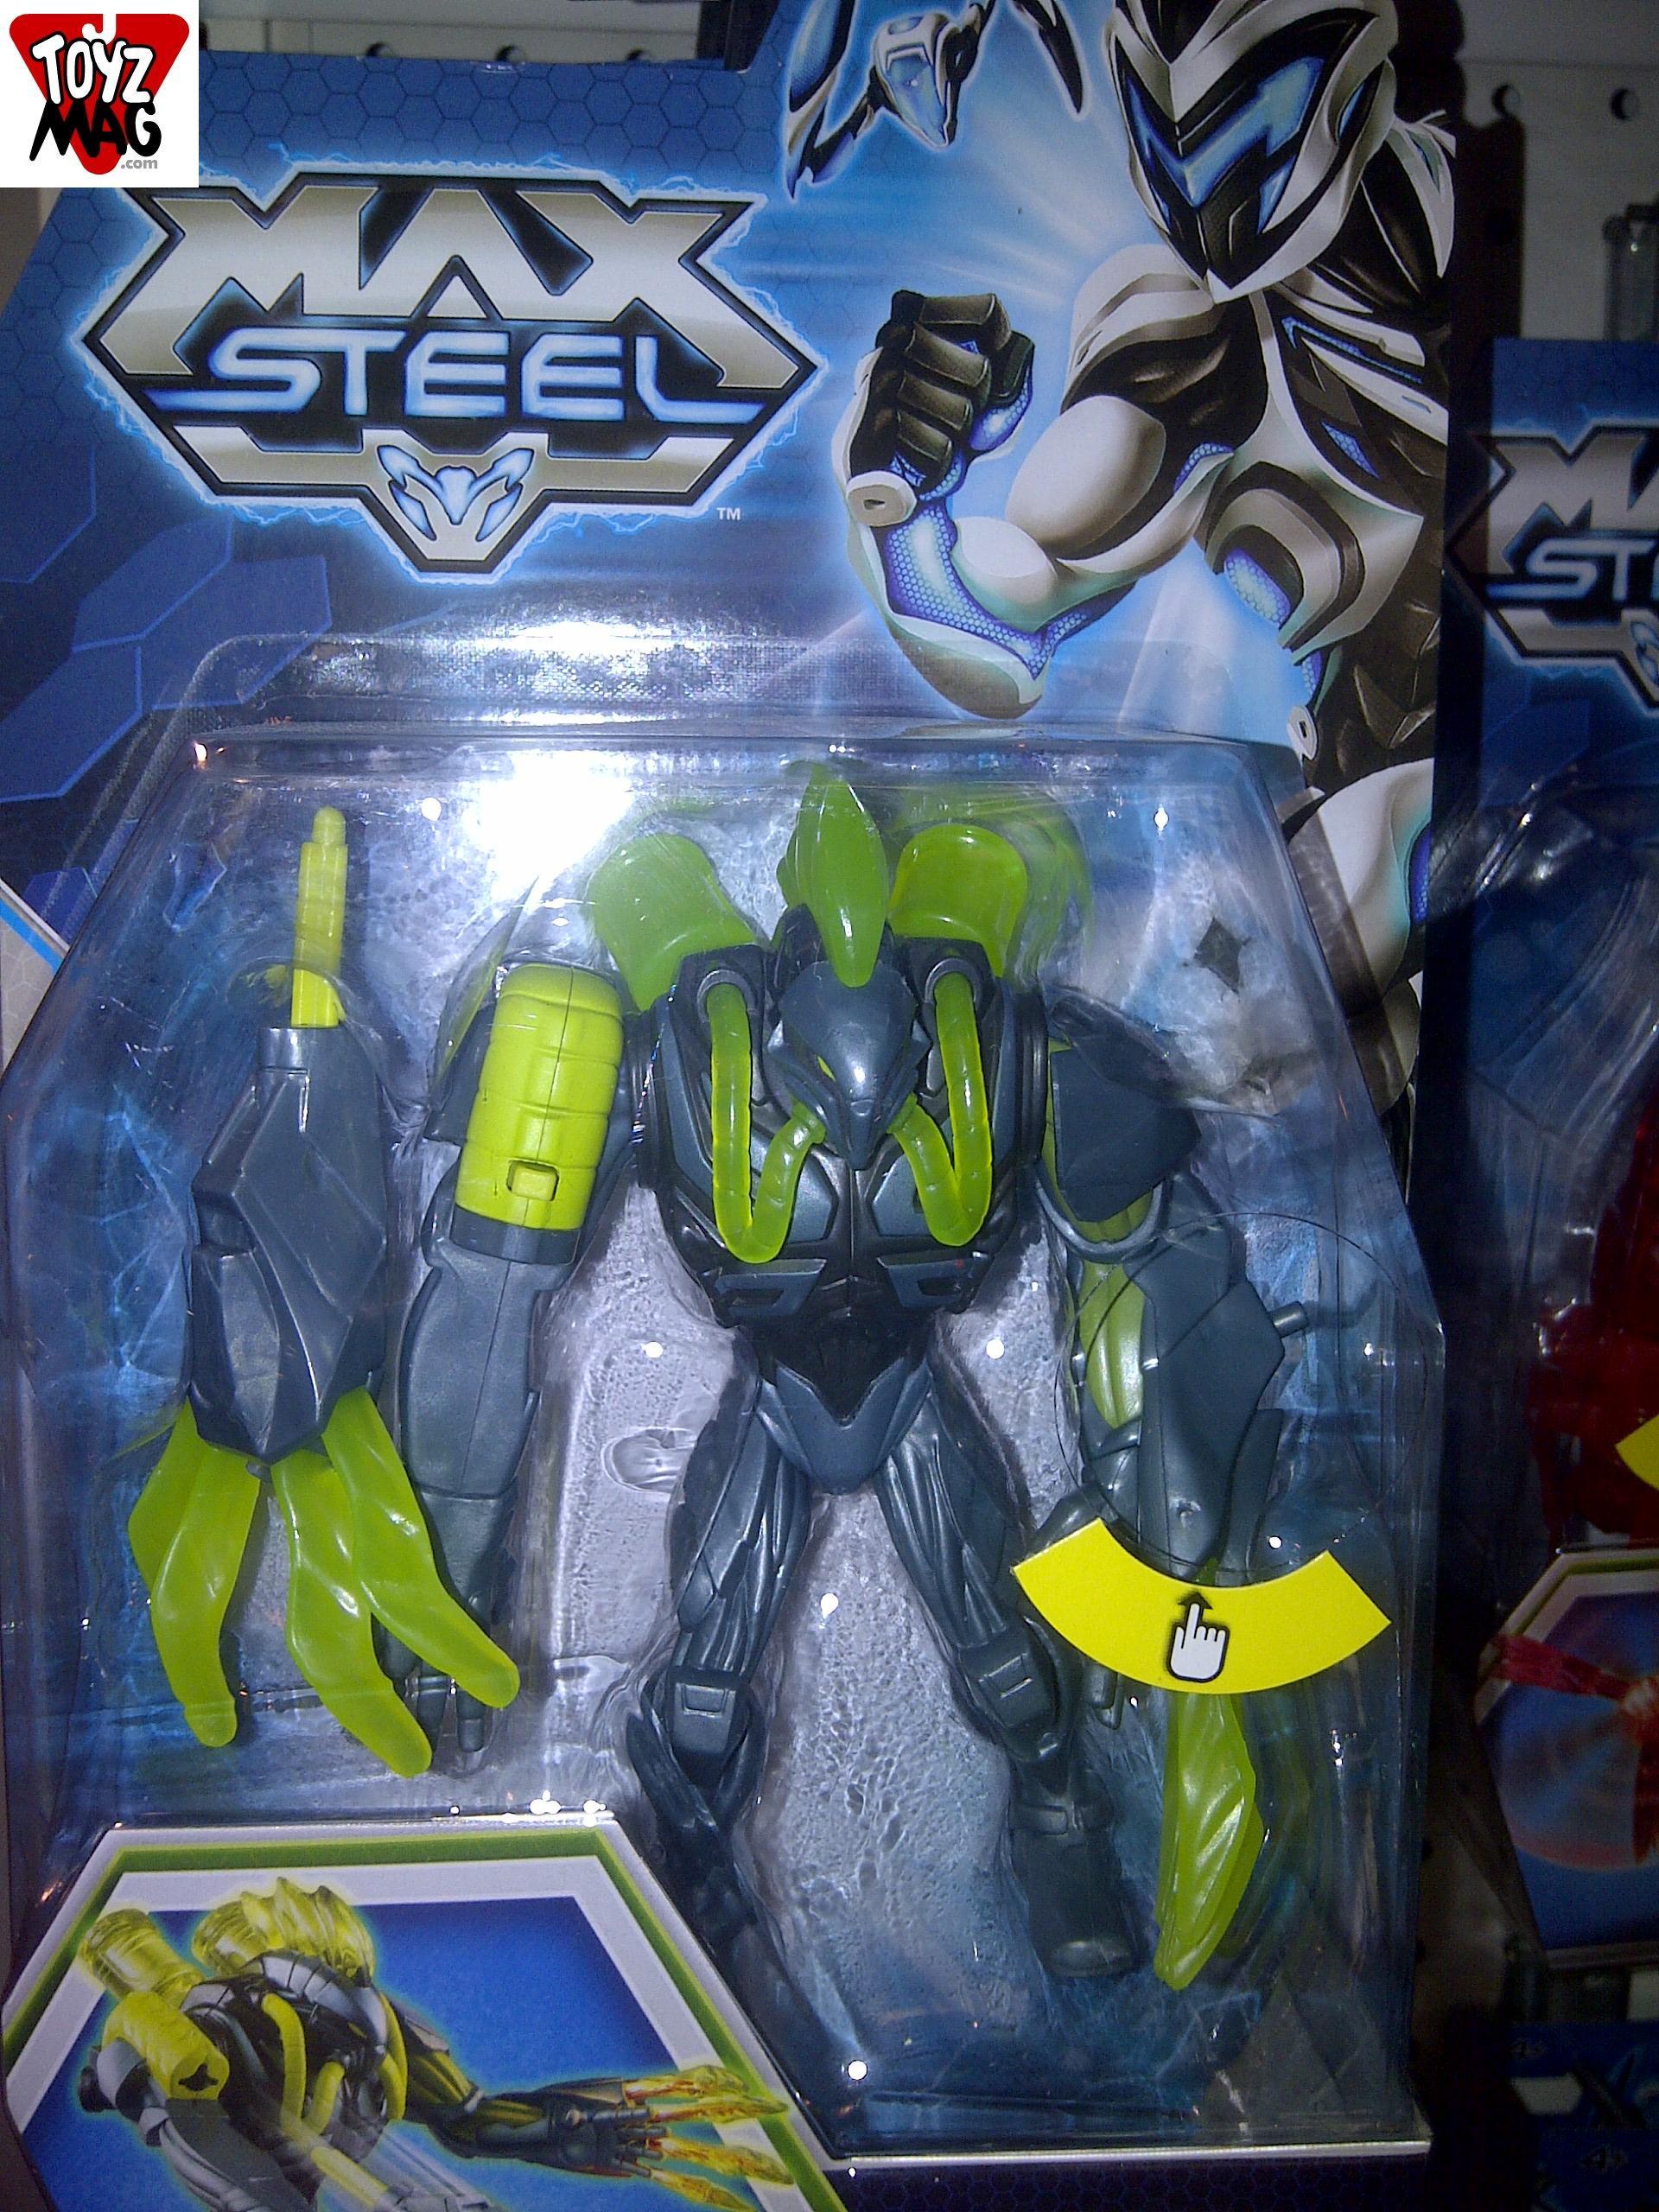 Max Steel Toys R Us : Toyzmag toys r us la défense aout